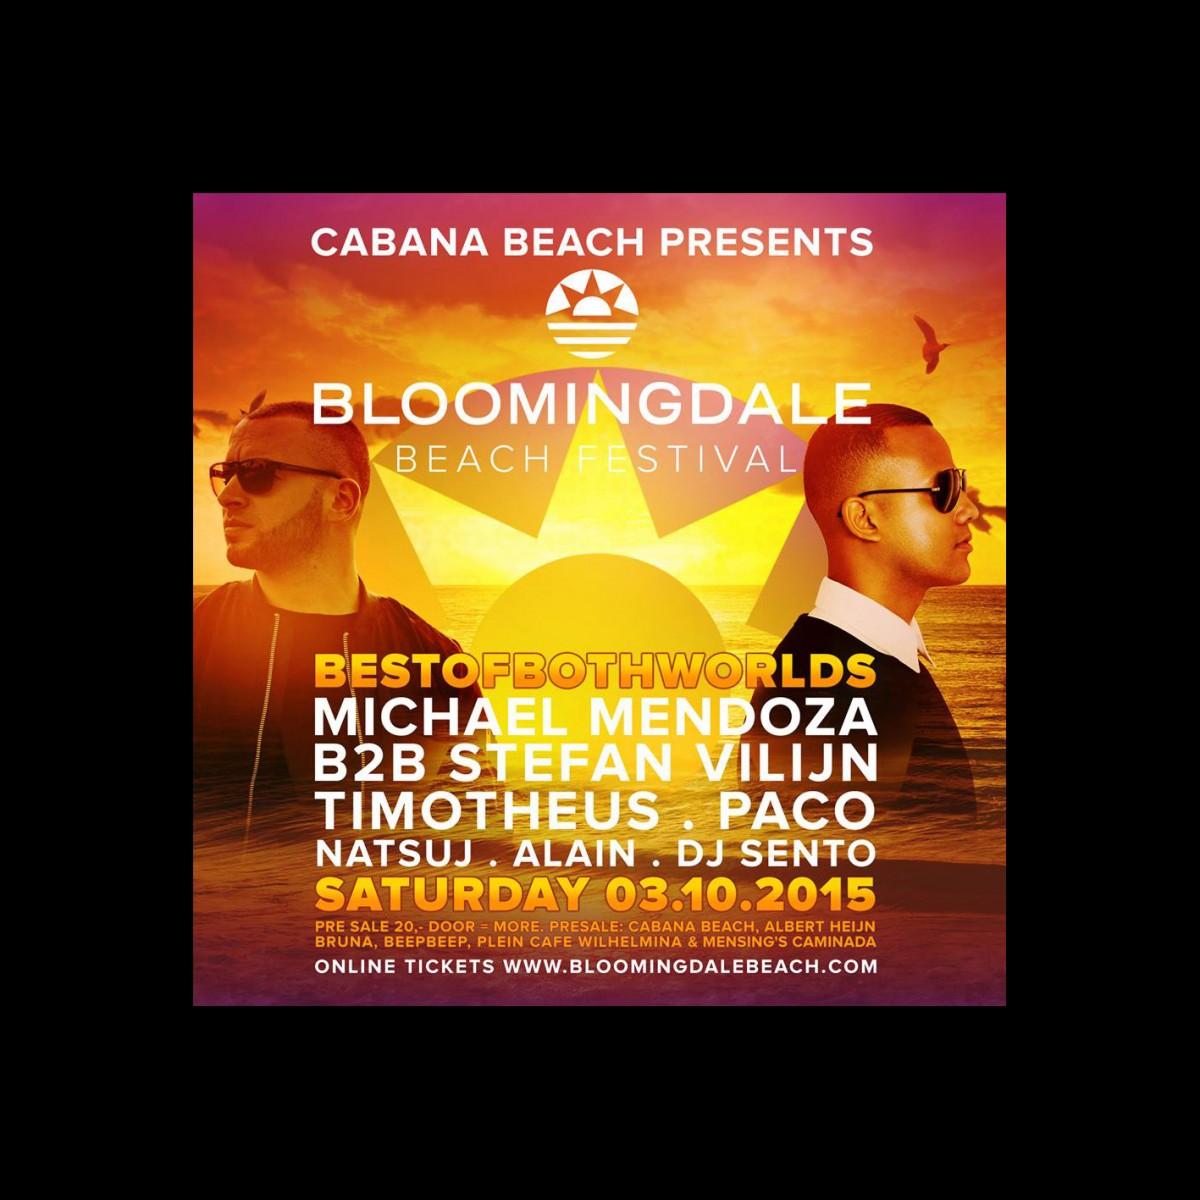 Cabana Beach Presents: Best Of Both Worlds